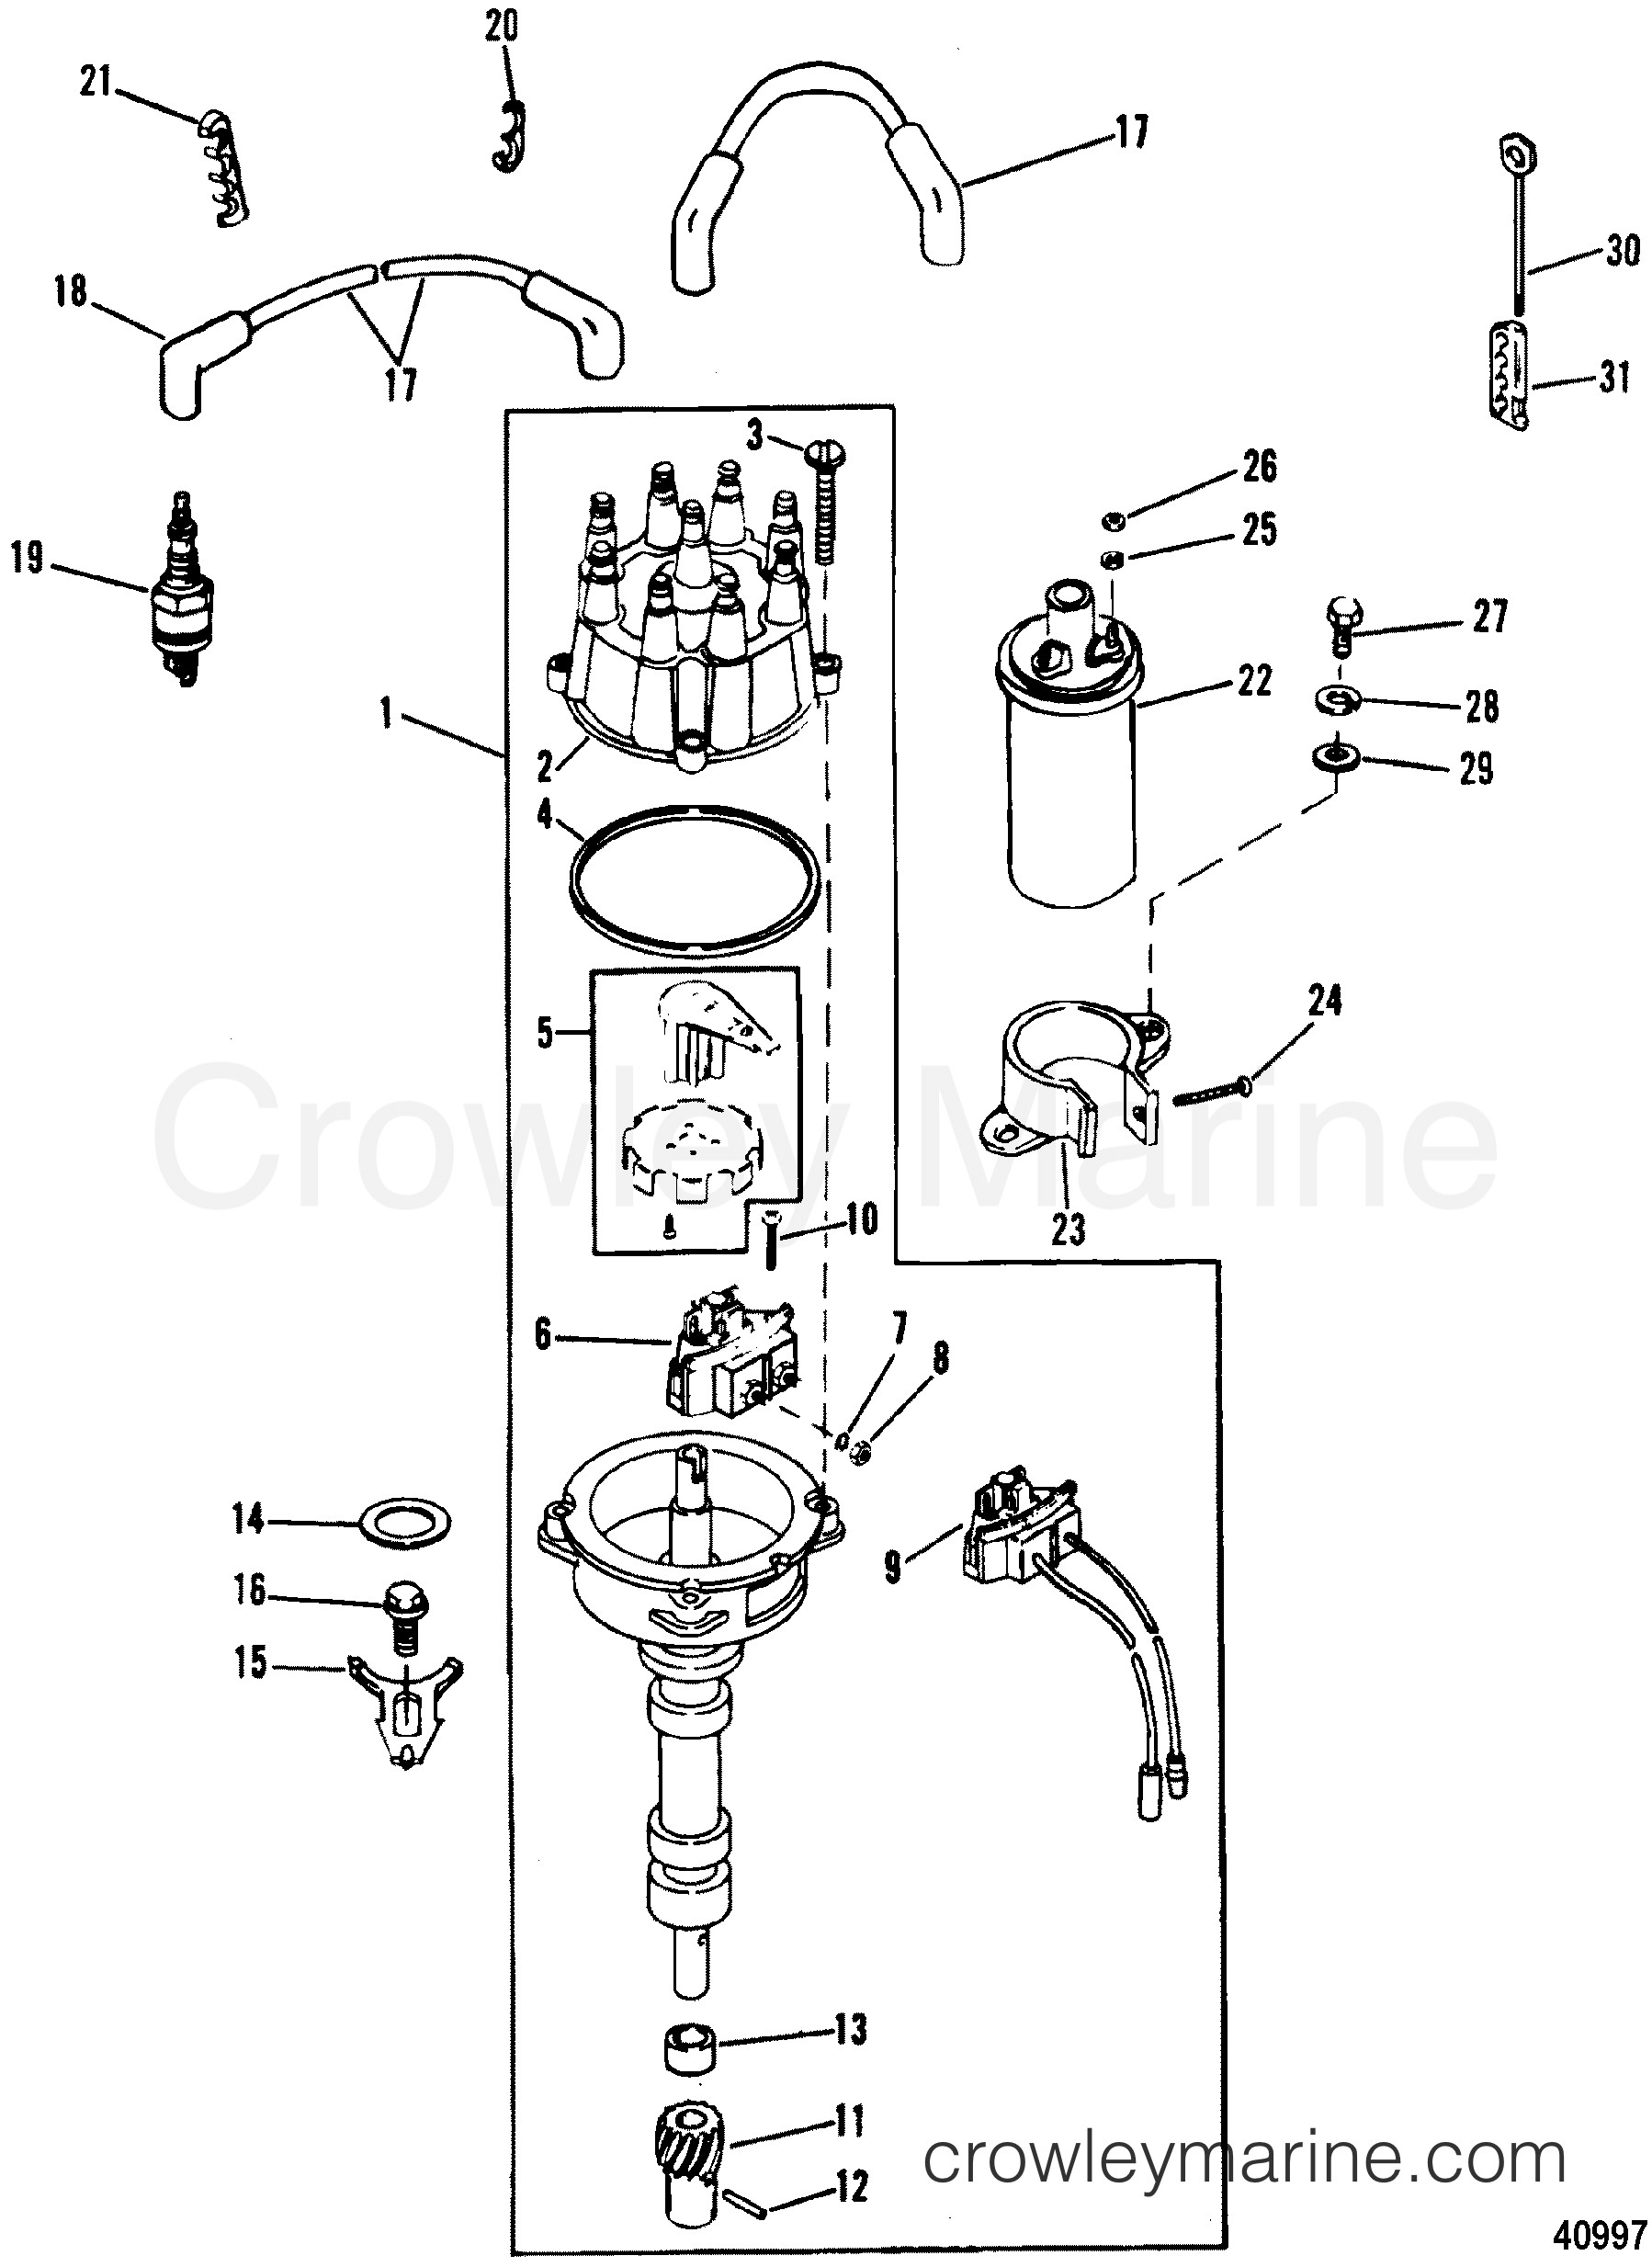 mercruiser ignition wiring diagram wiring diagram image rh mainetreasurechest com mercruiser 3.0 distributor wiring 1999 Mercruiser Gauge Wiring